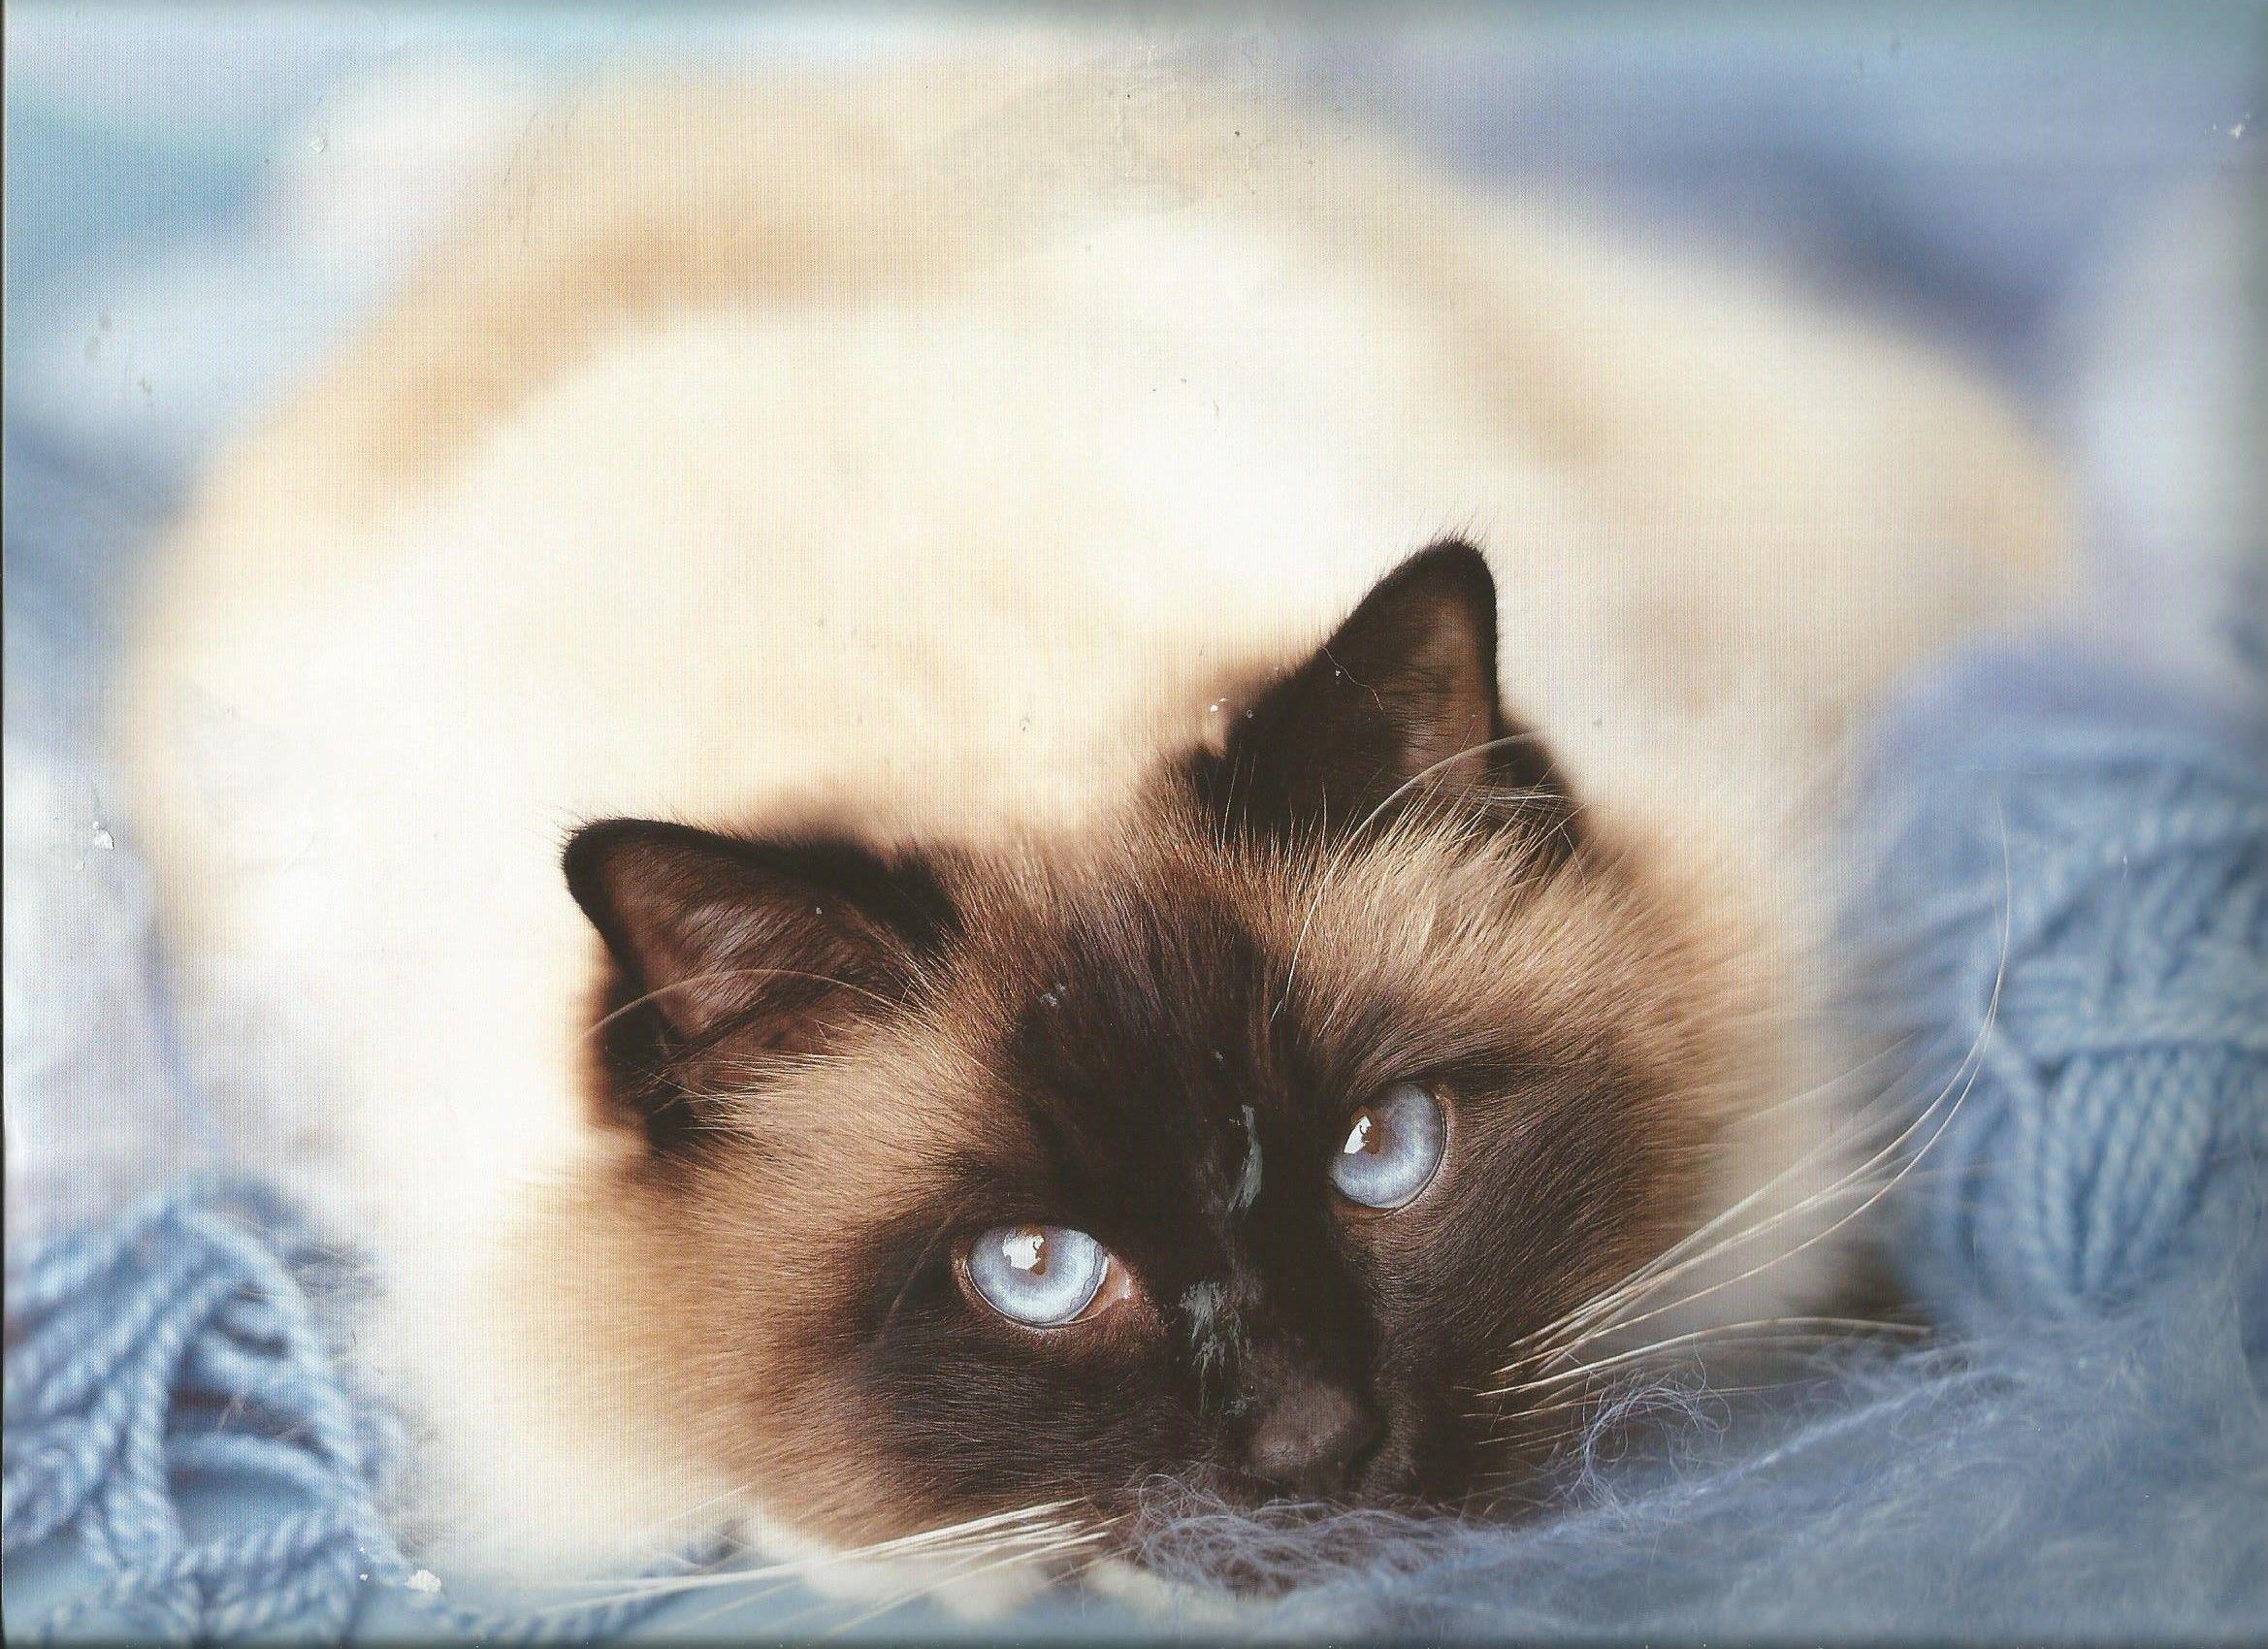 Pin by Deanna Hughes on Cats & Kittens Birman cat, Cat